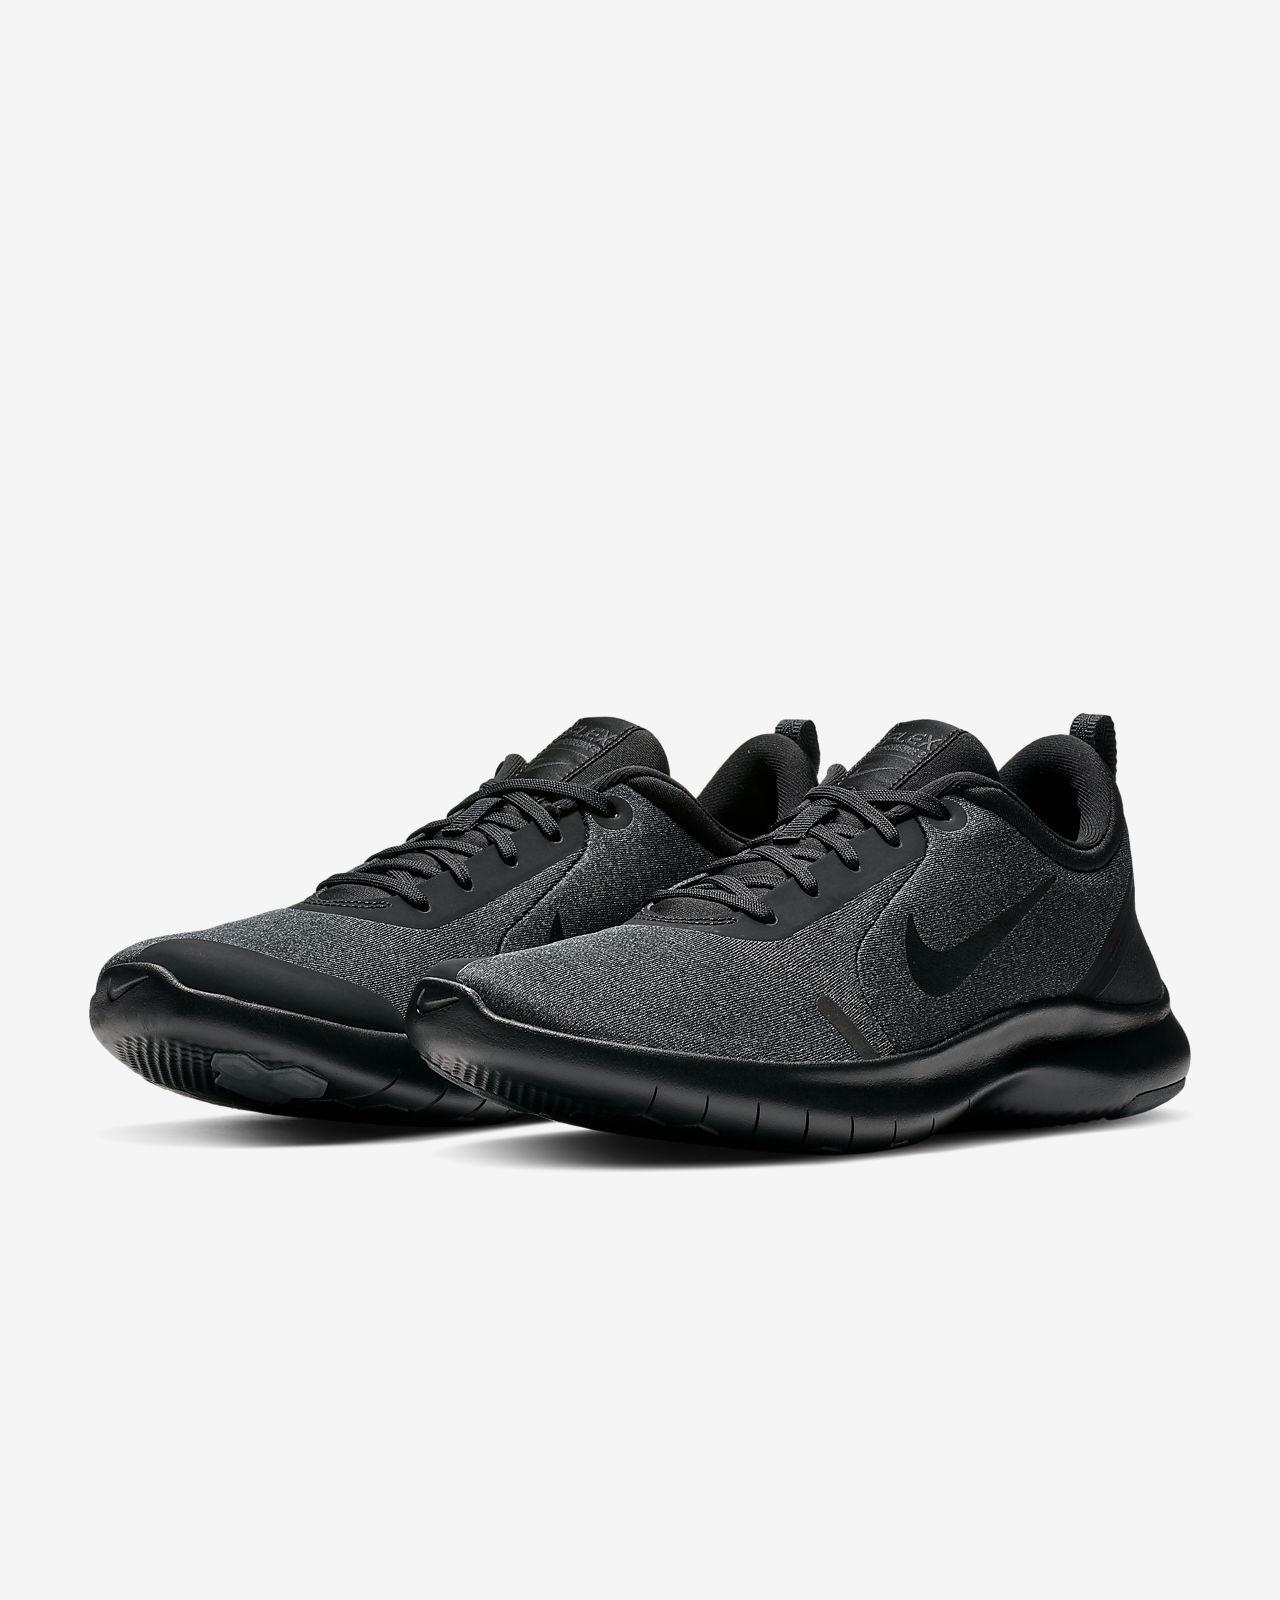 7cac55a49f879 Nike Flex Experience RN 8 Men s Running Shoe. Nike.com BE